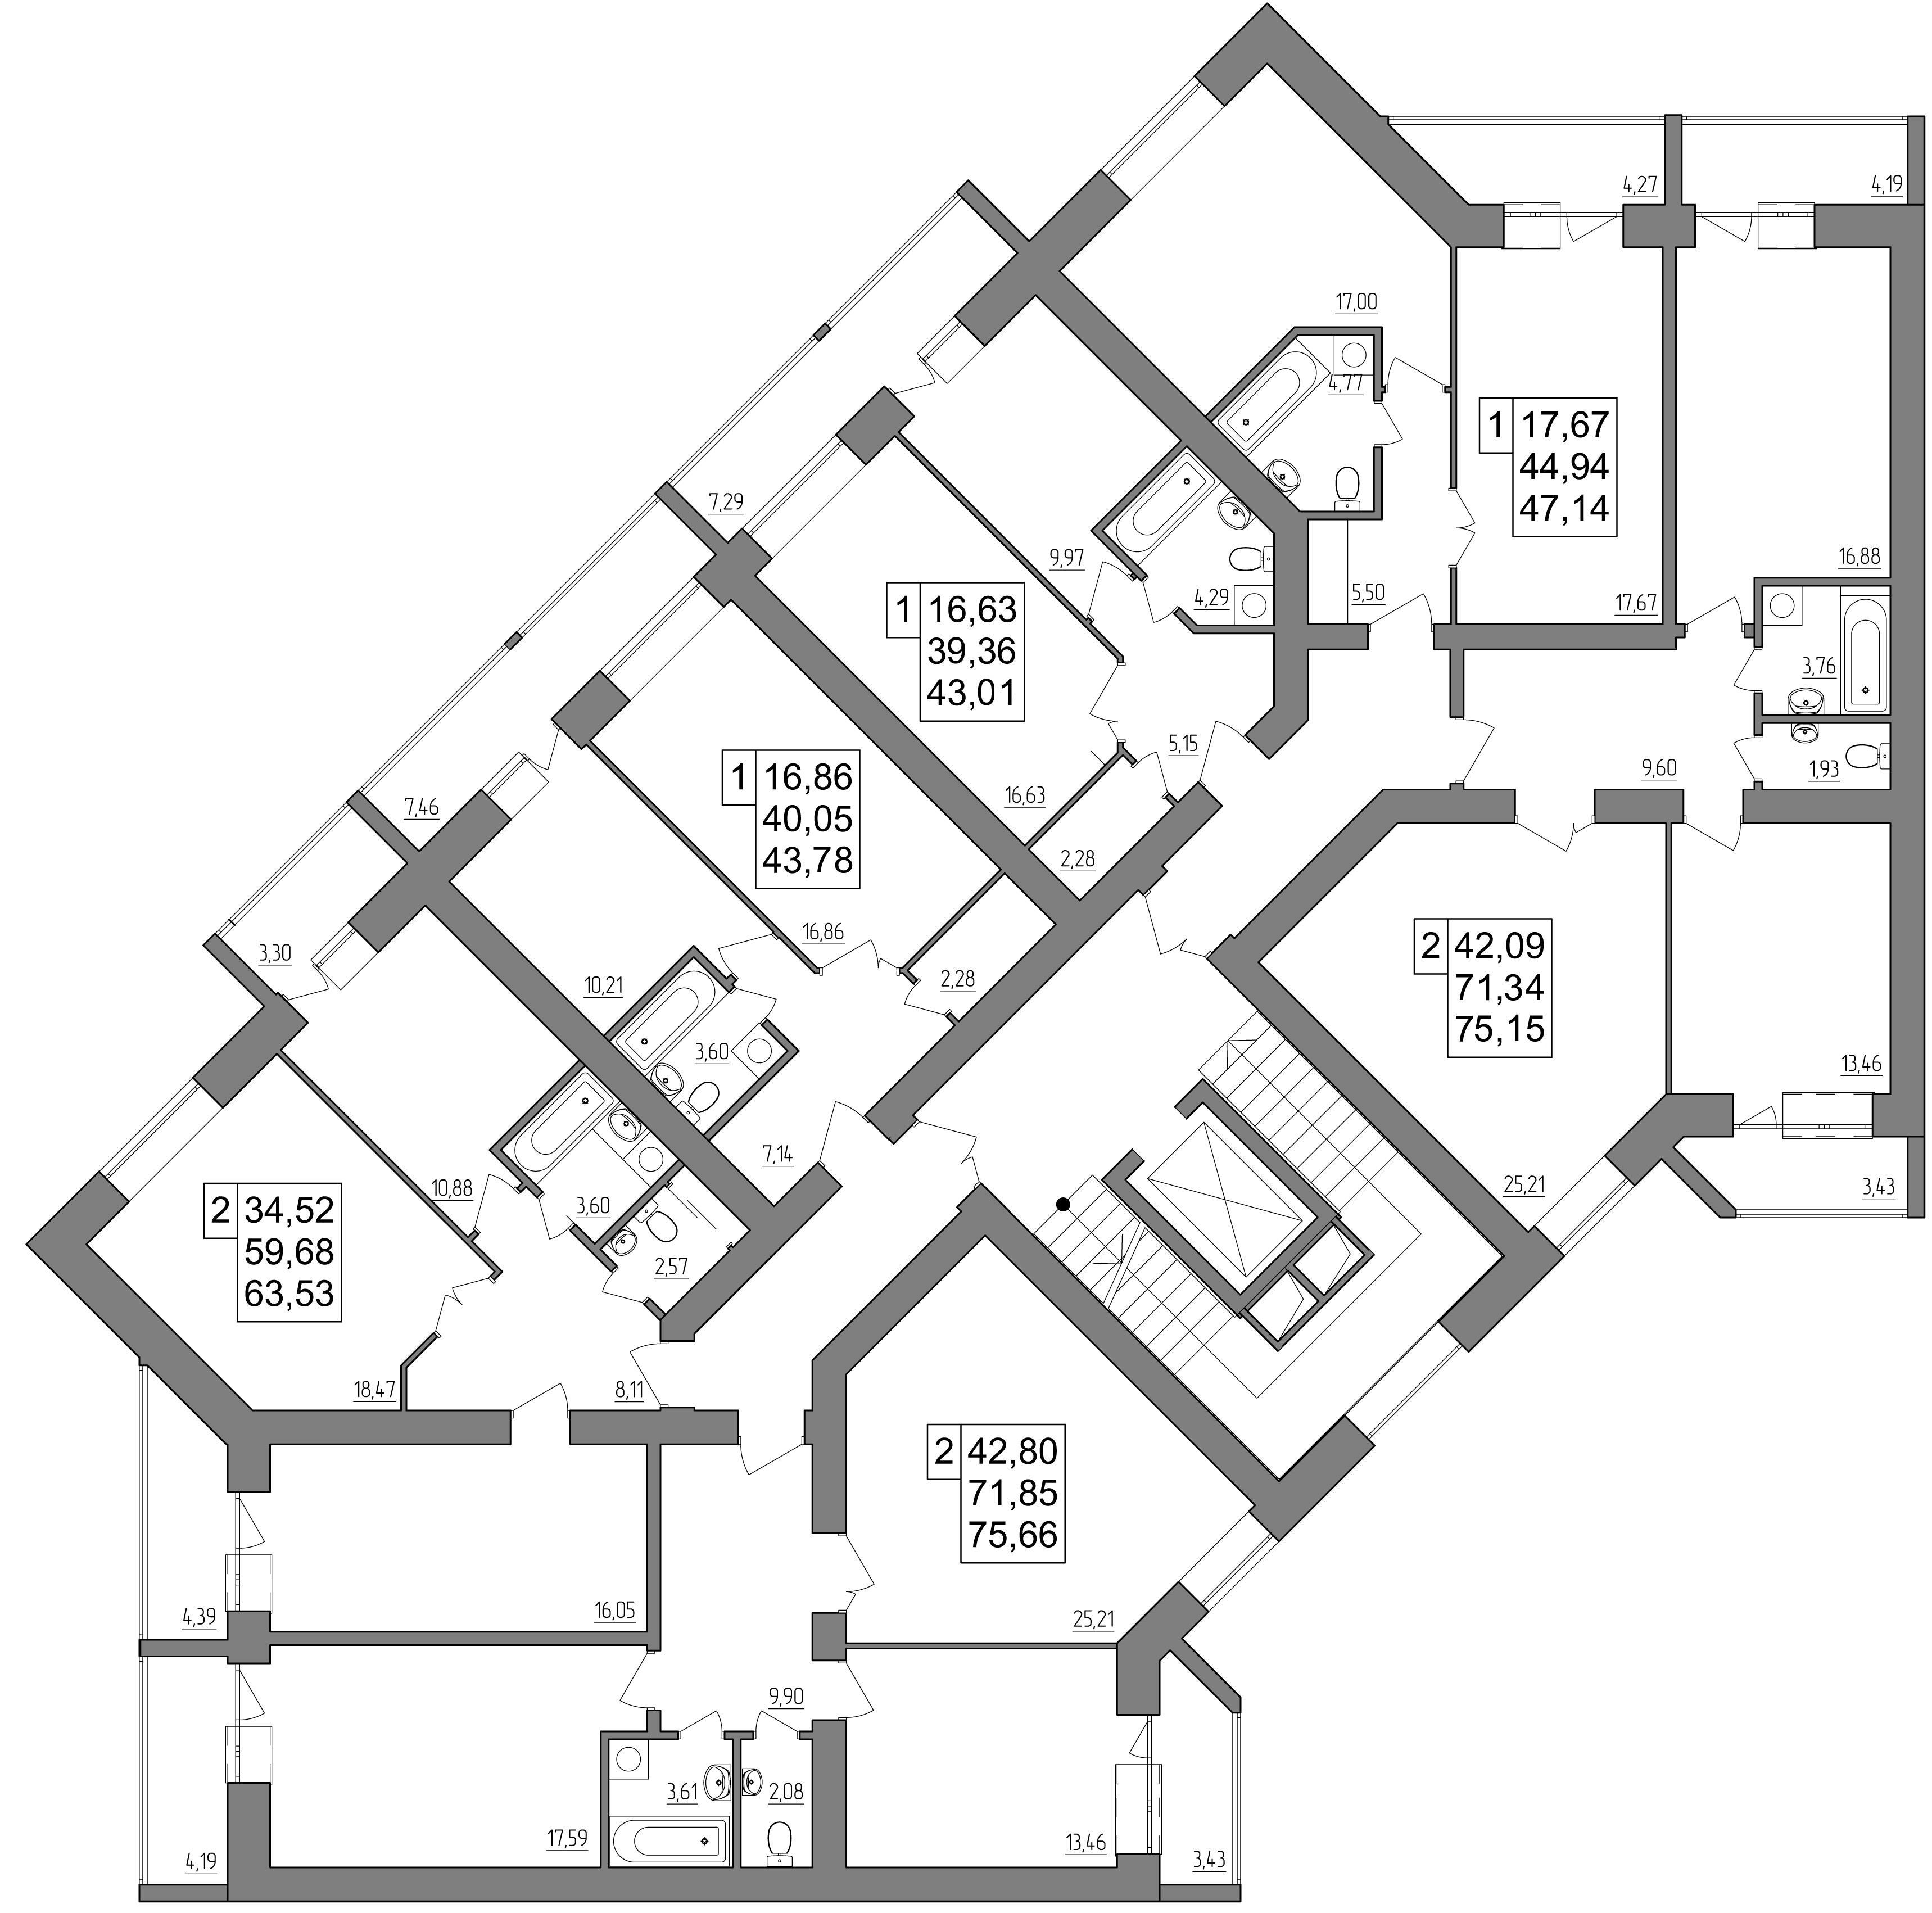 проект 1 этажа дома на Кибальчича (секция 2-4-6)